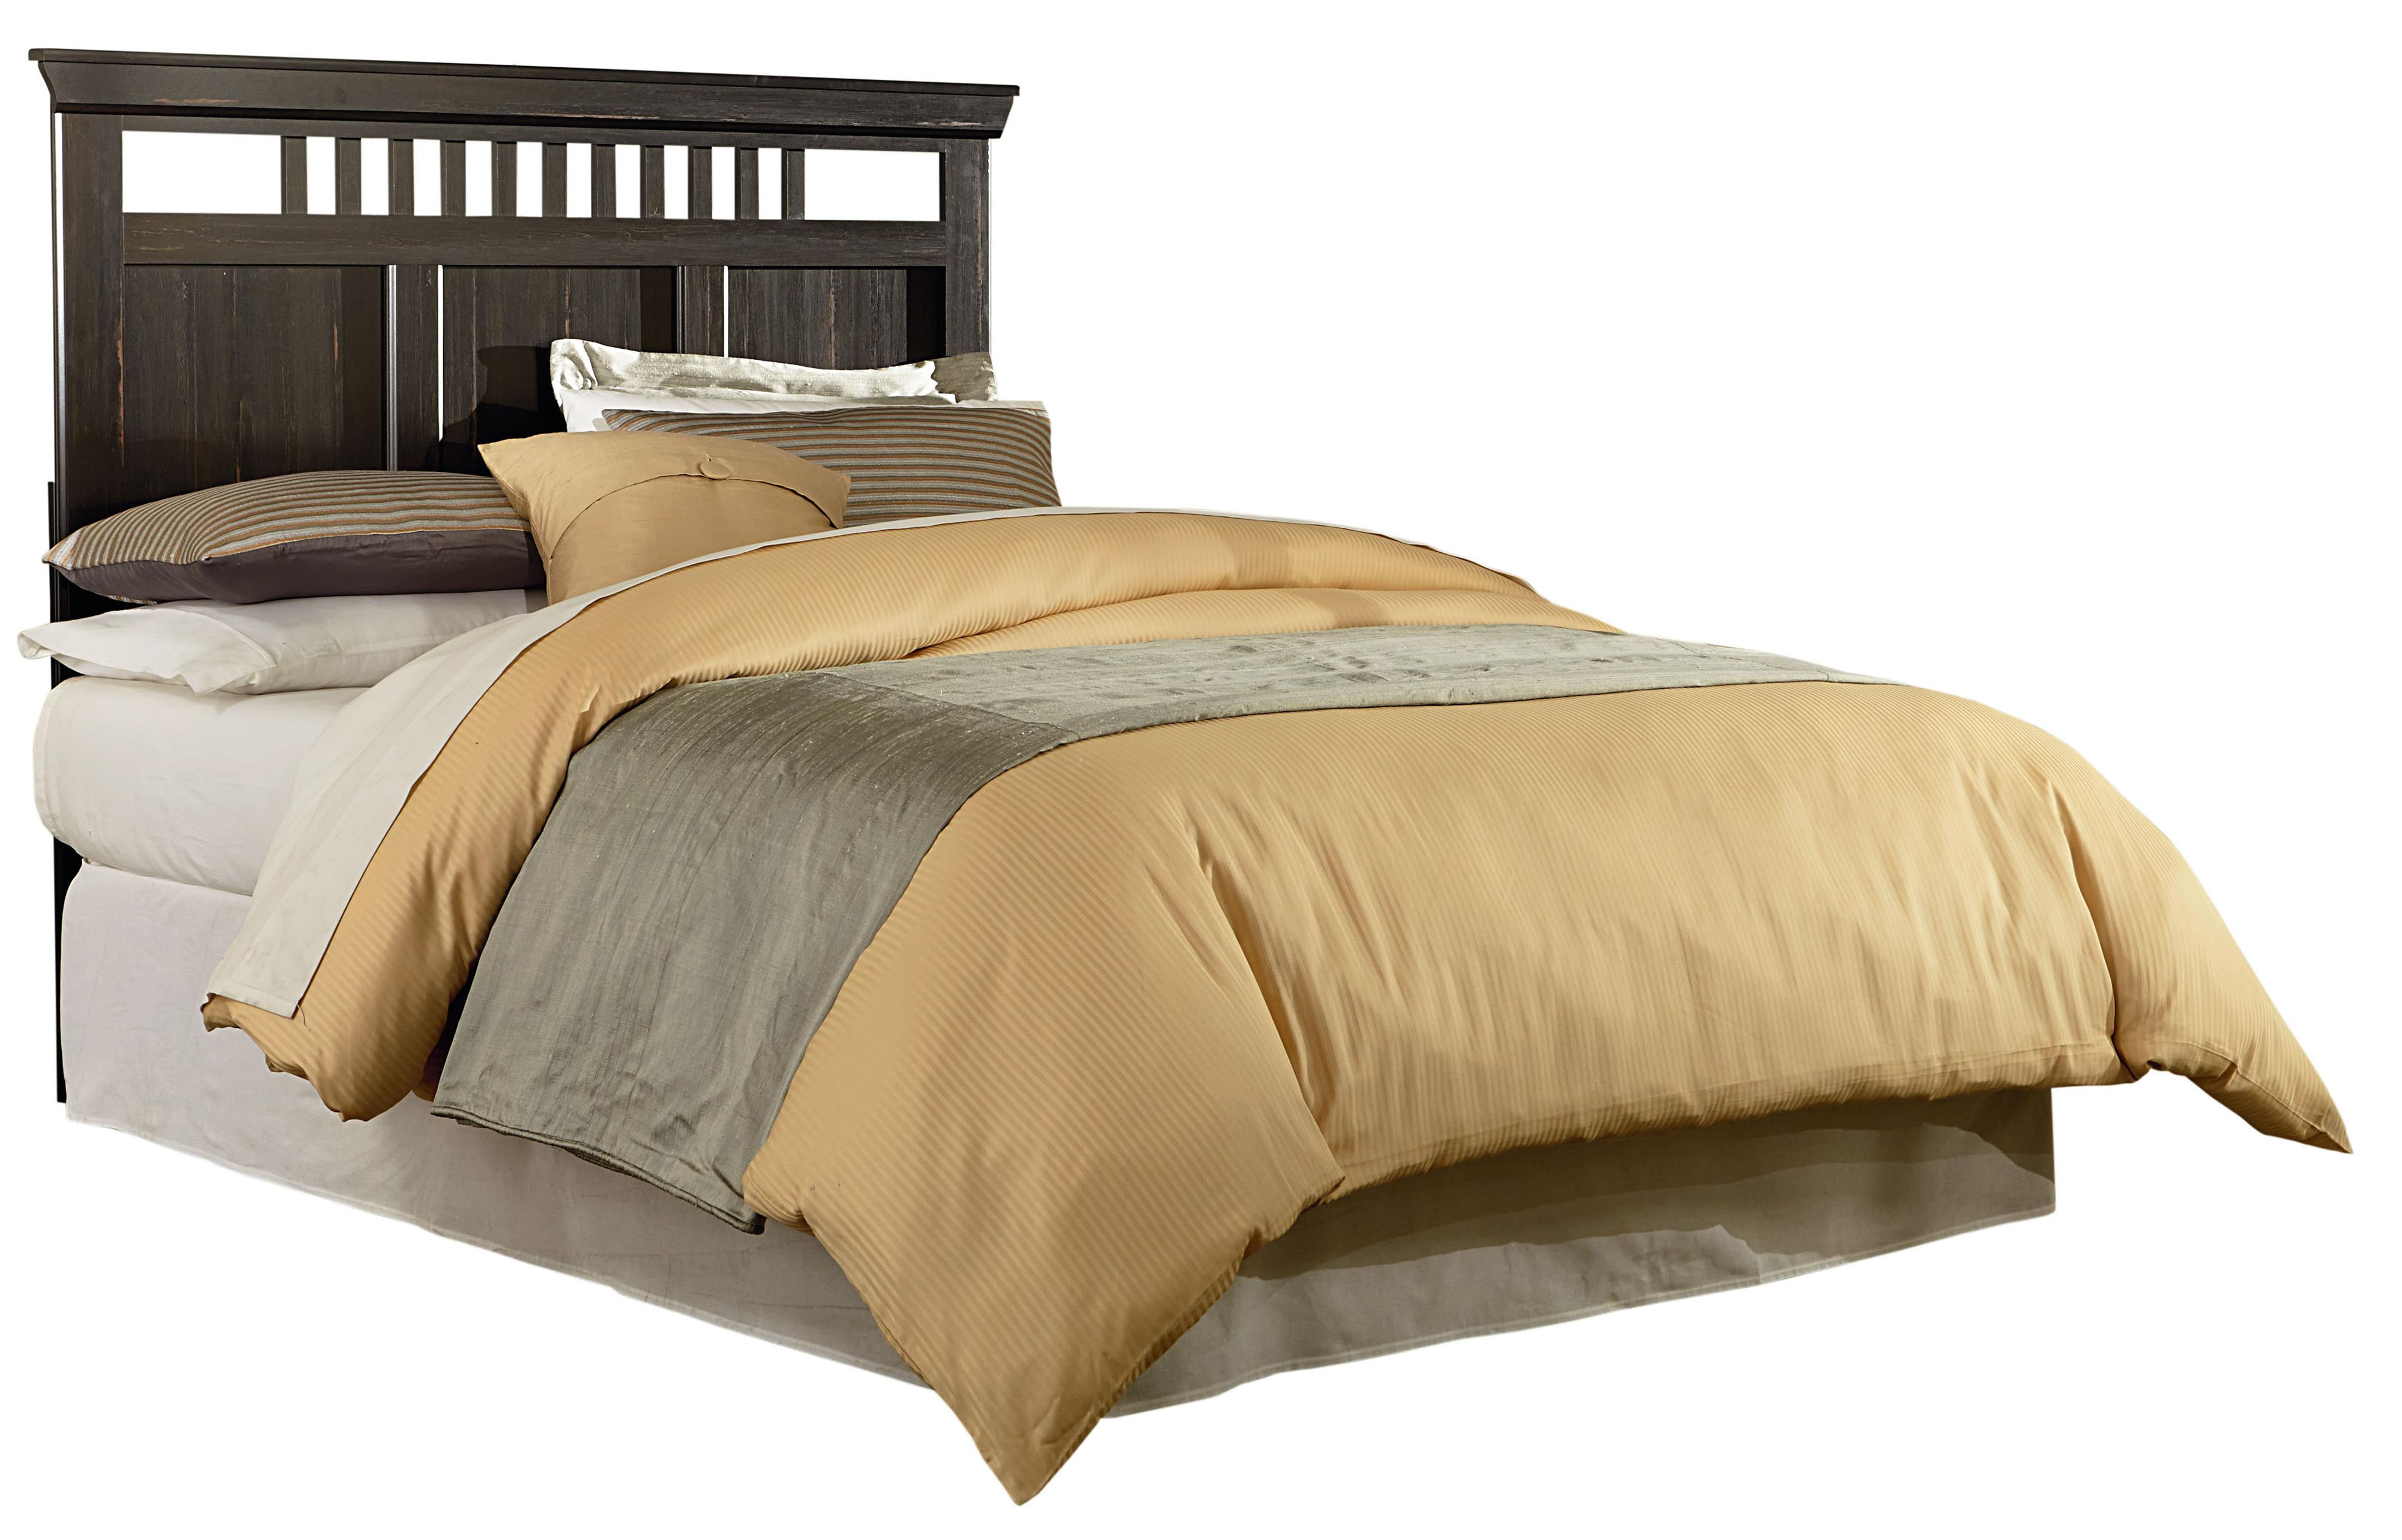 Standard Furniture Hampton Twin Headboard - Item Number: 52053